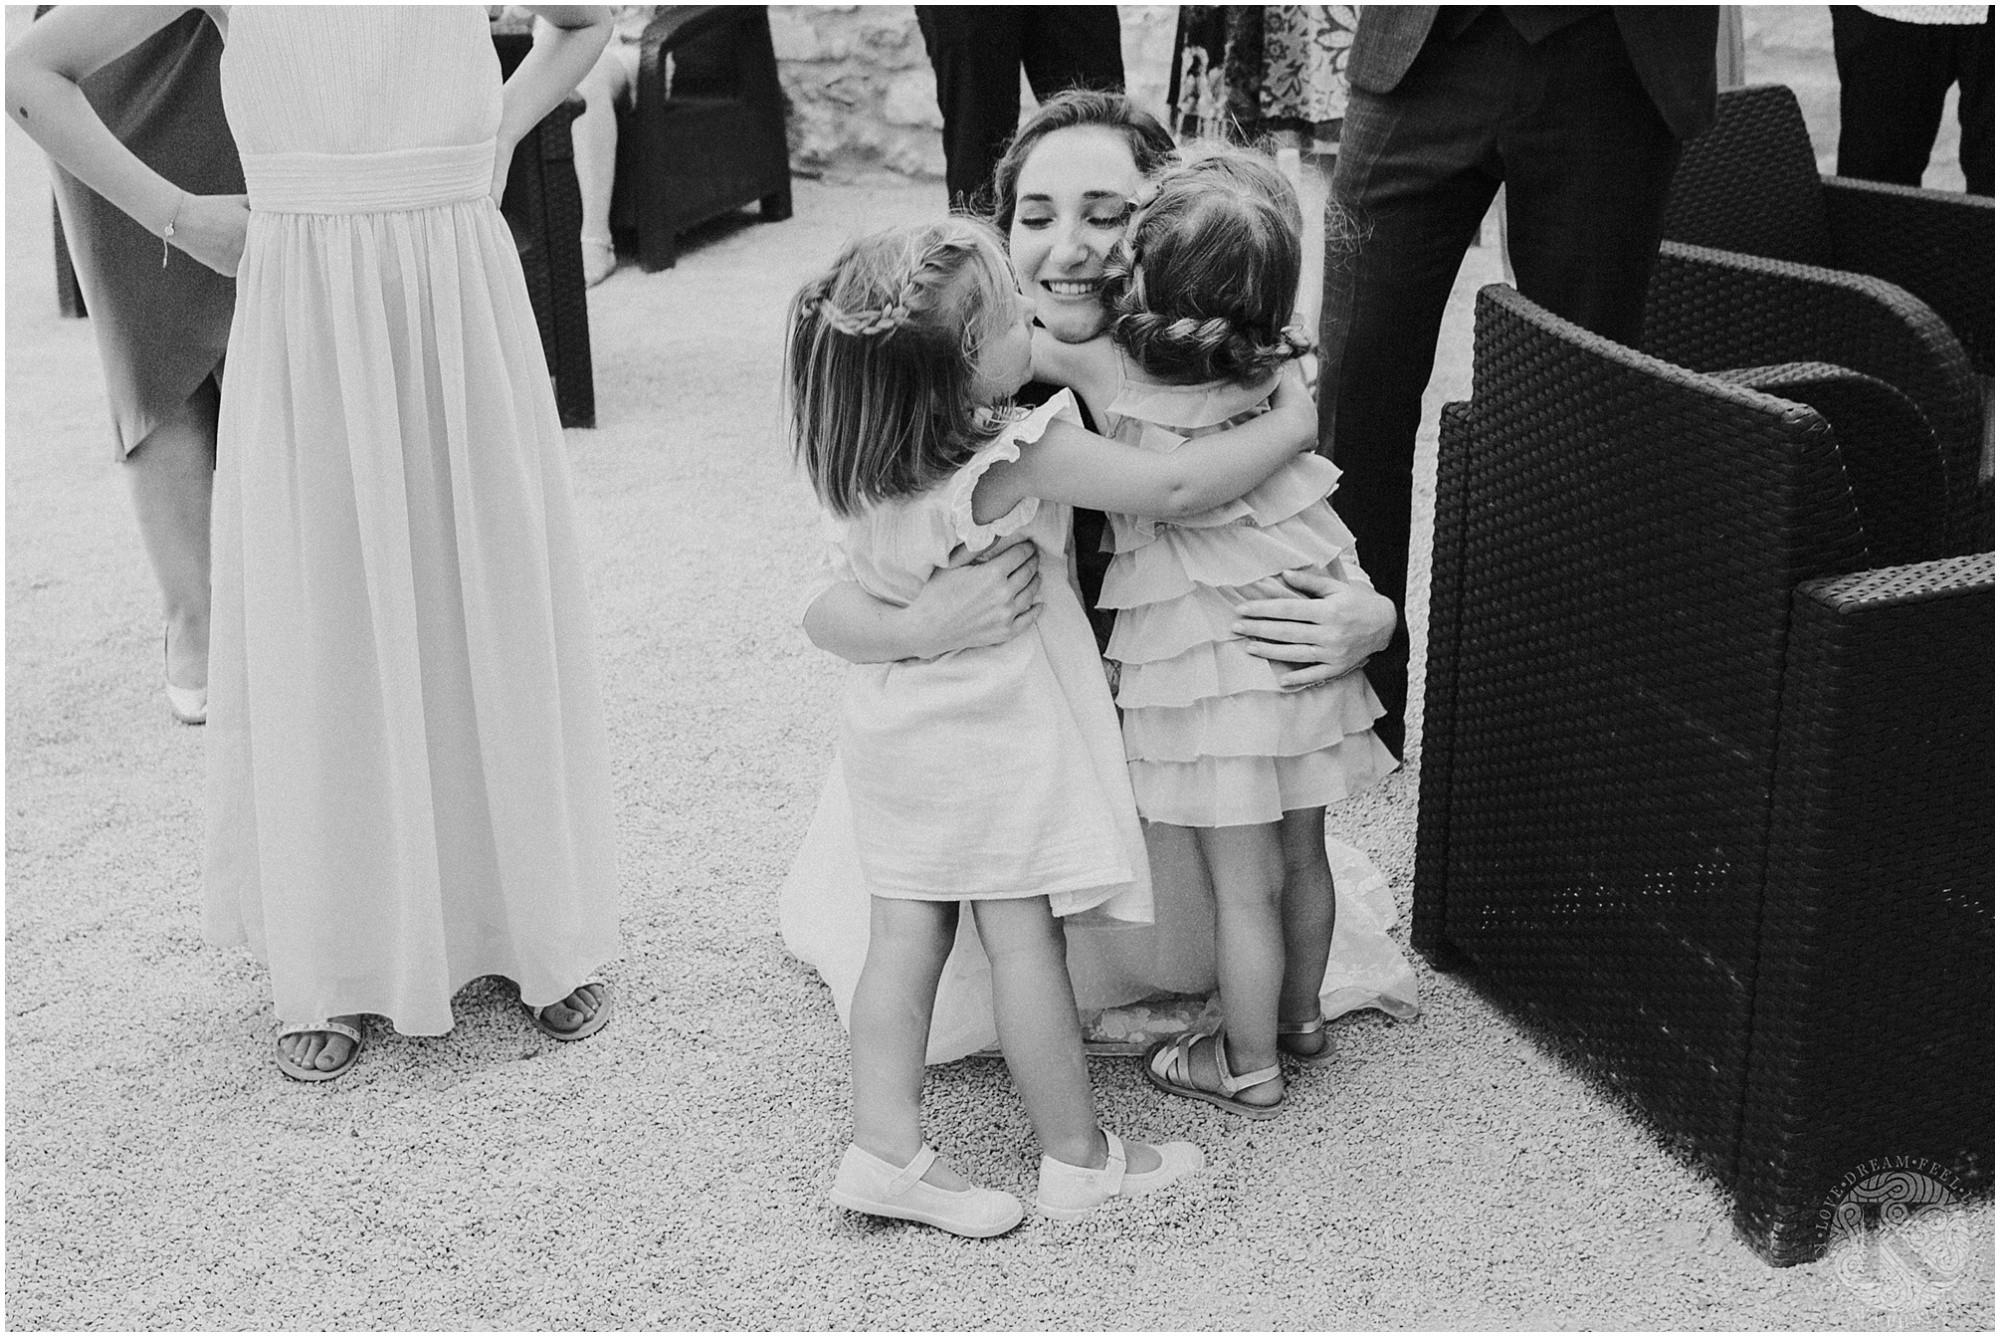 Kateryna-photos-photographe-mariage-vaucluse-provence-avignon-ferme-st-hugues_0066.jpg